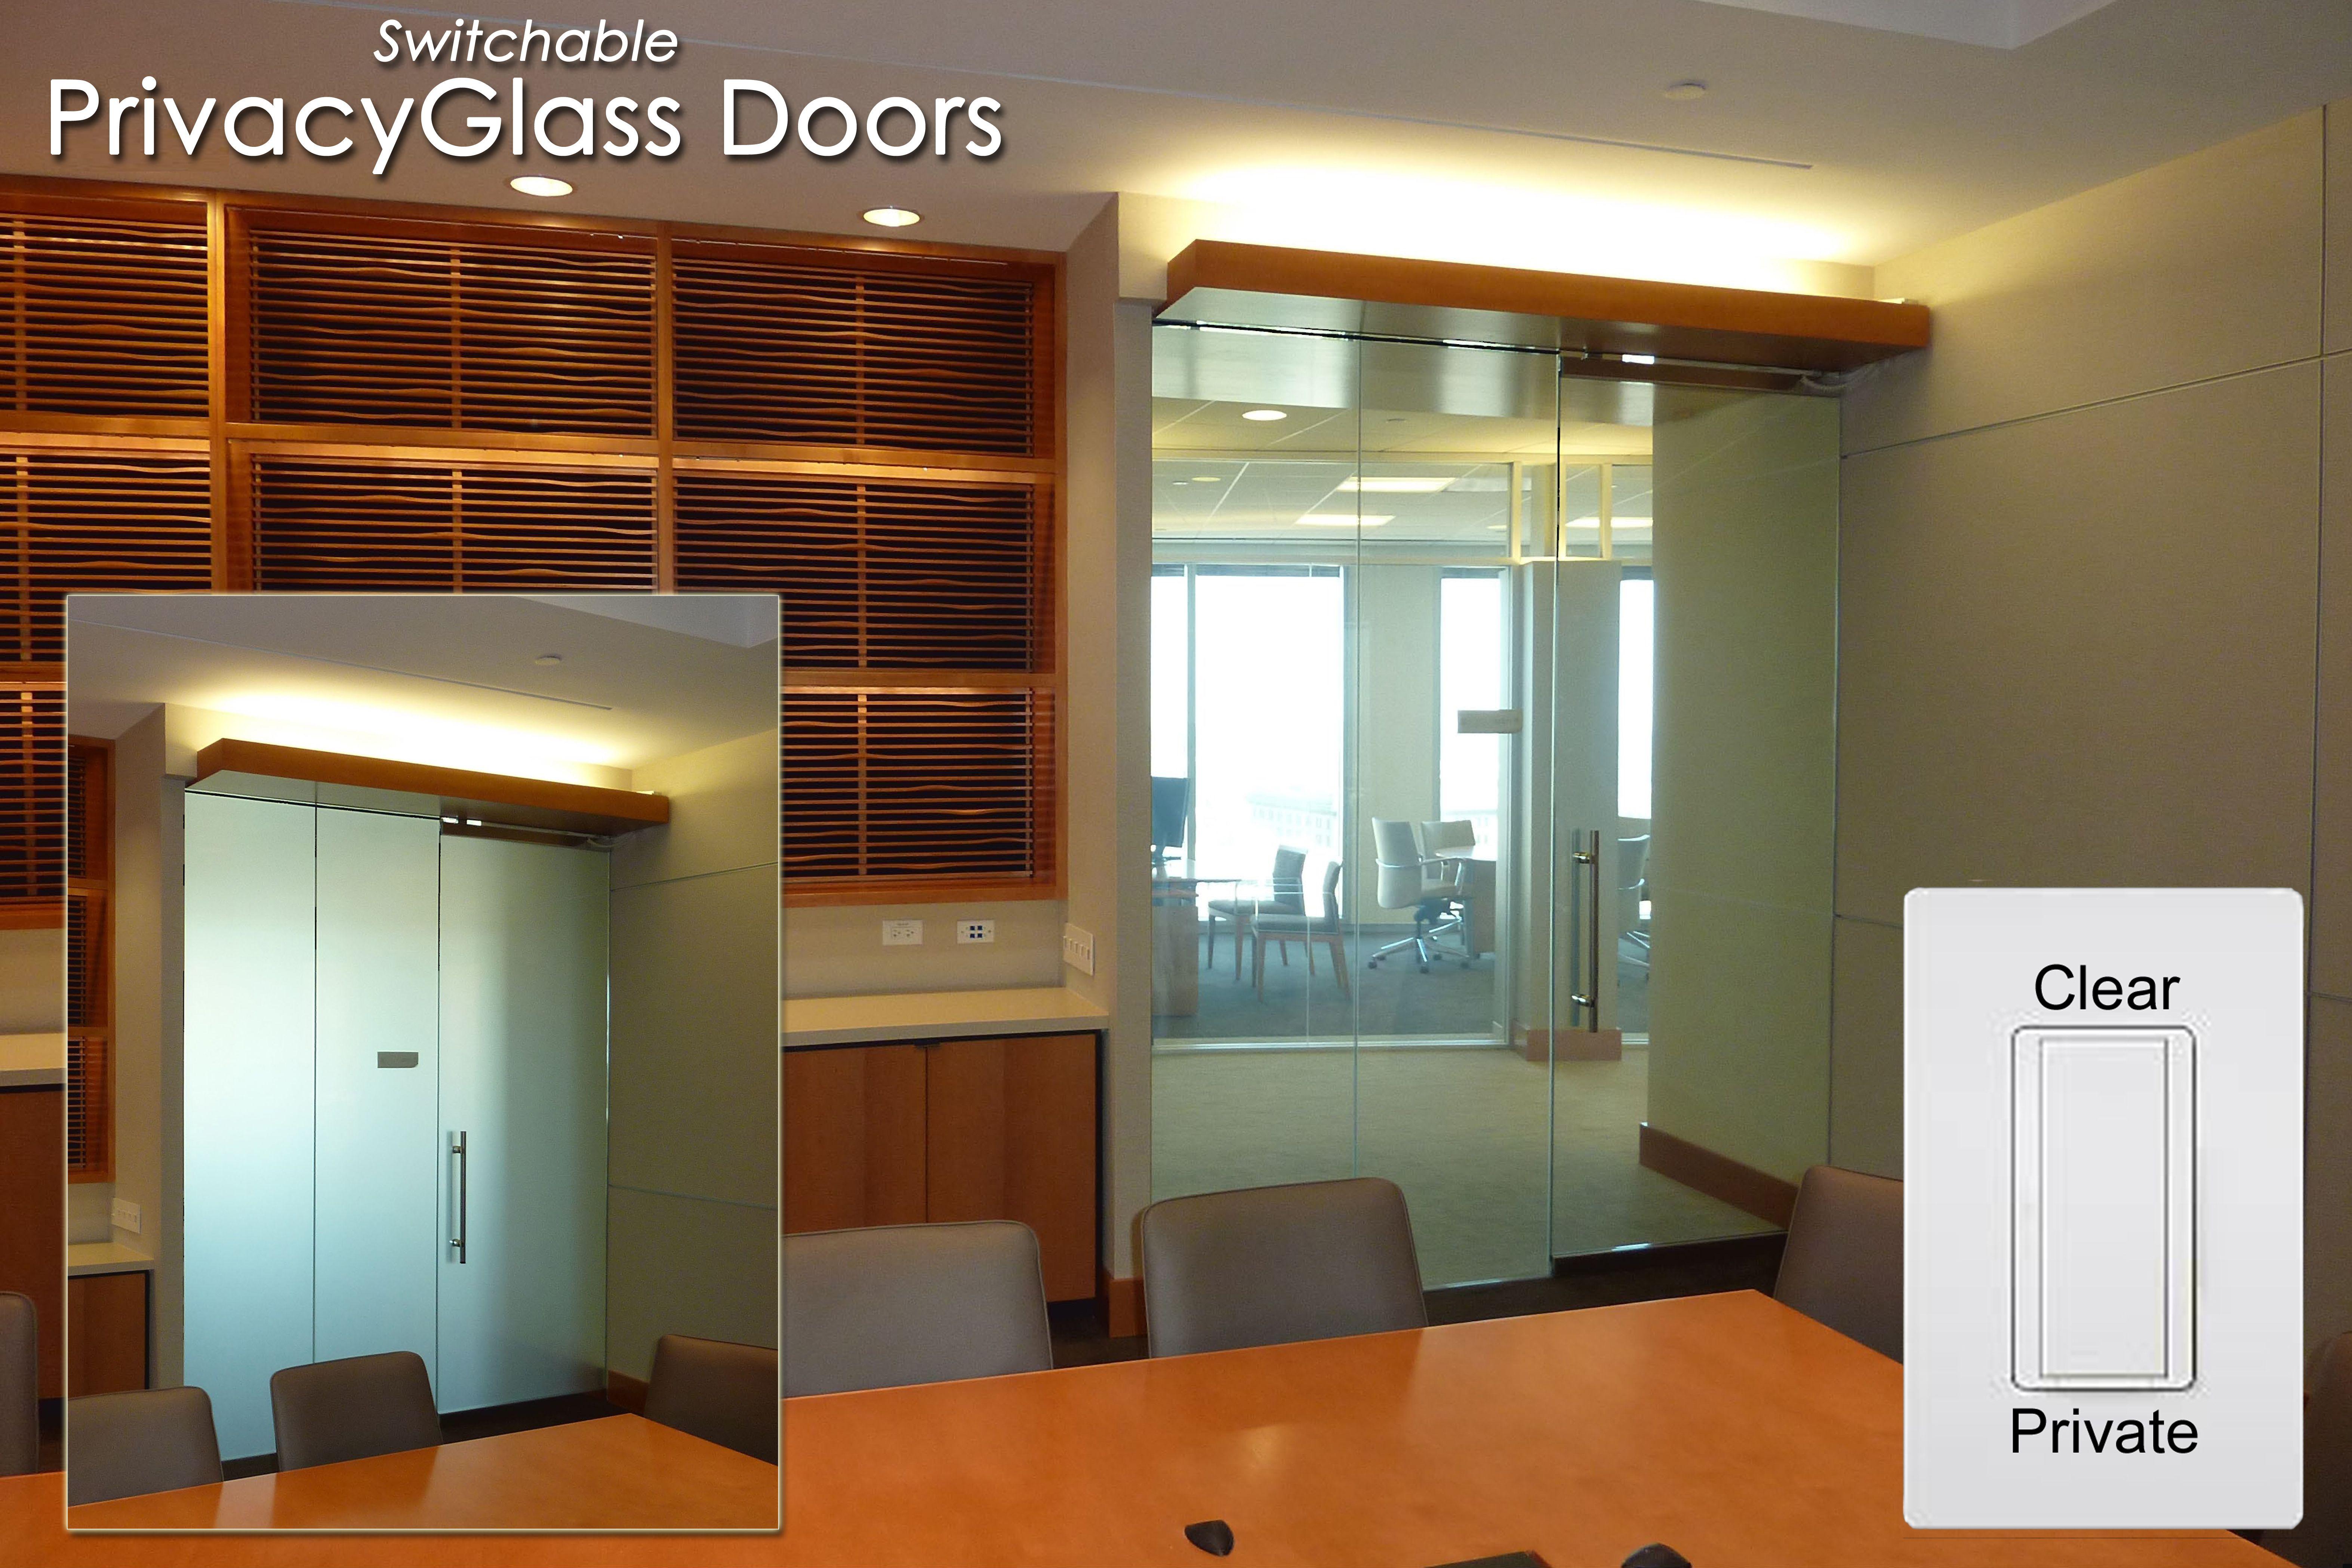 Switchable privacy glass glass door eglass pinterest privacy switchable privacy glass glass door planetlyrics Gallery